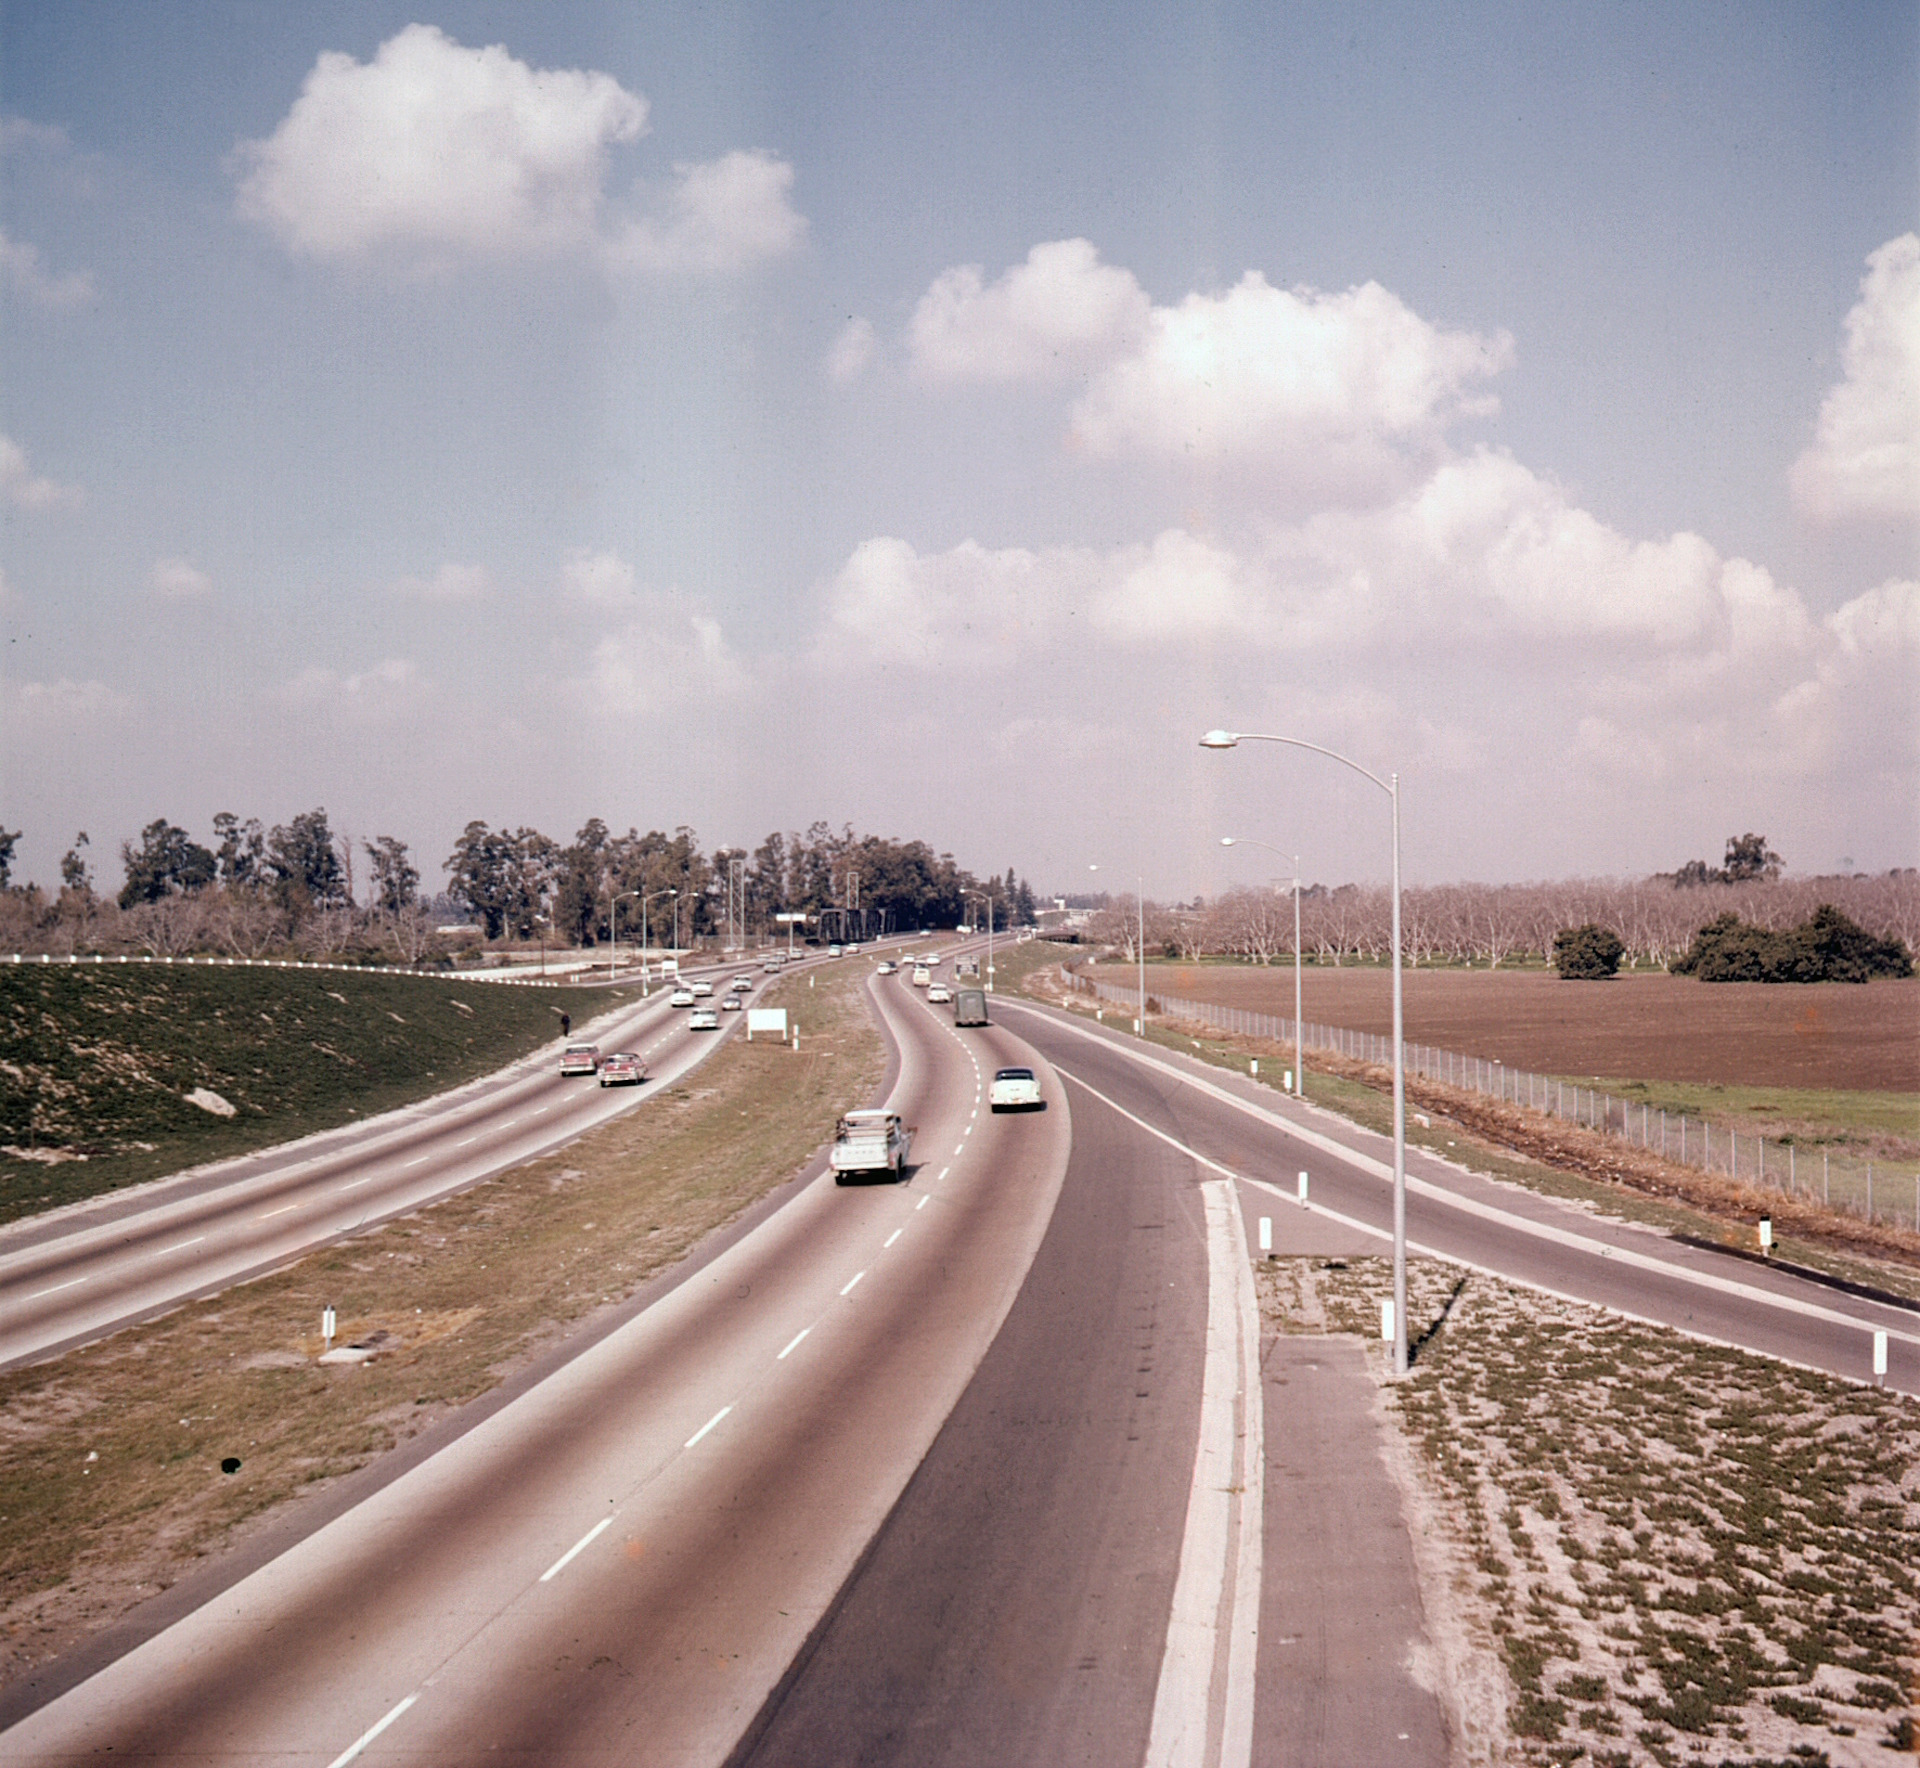 Santa Ana Freeway in Tustin, circa 1960